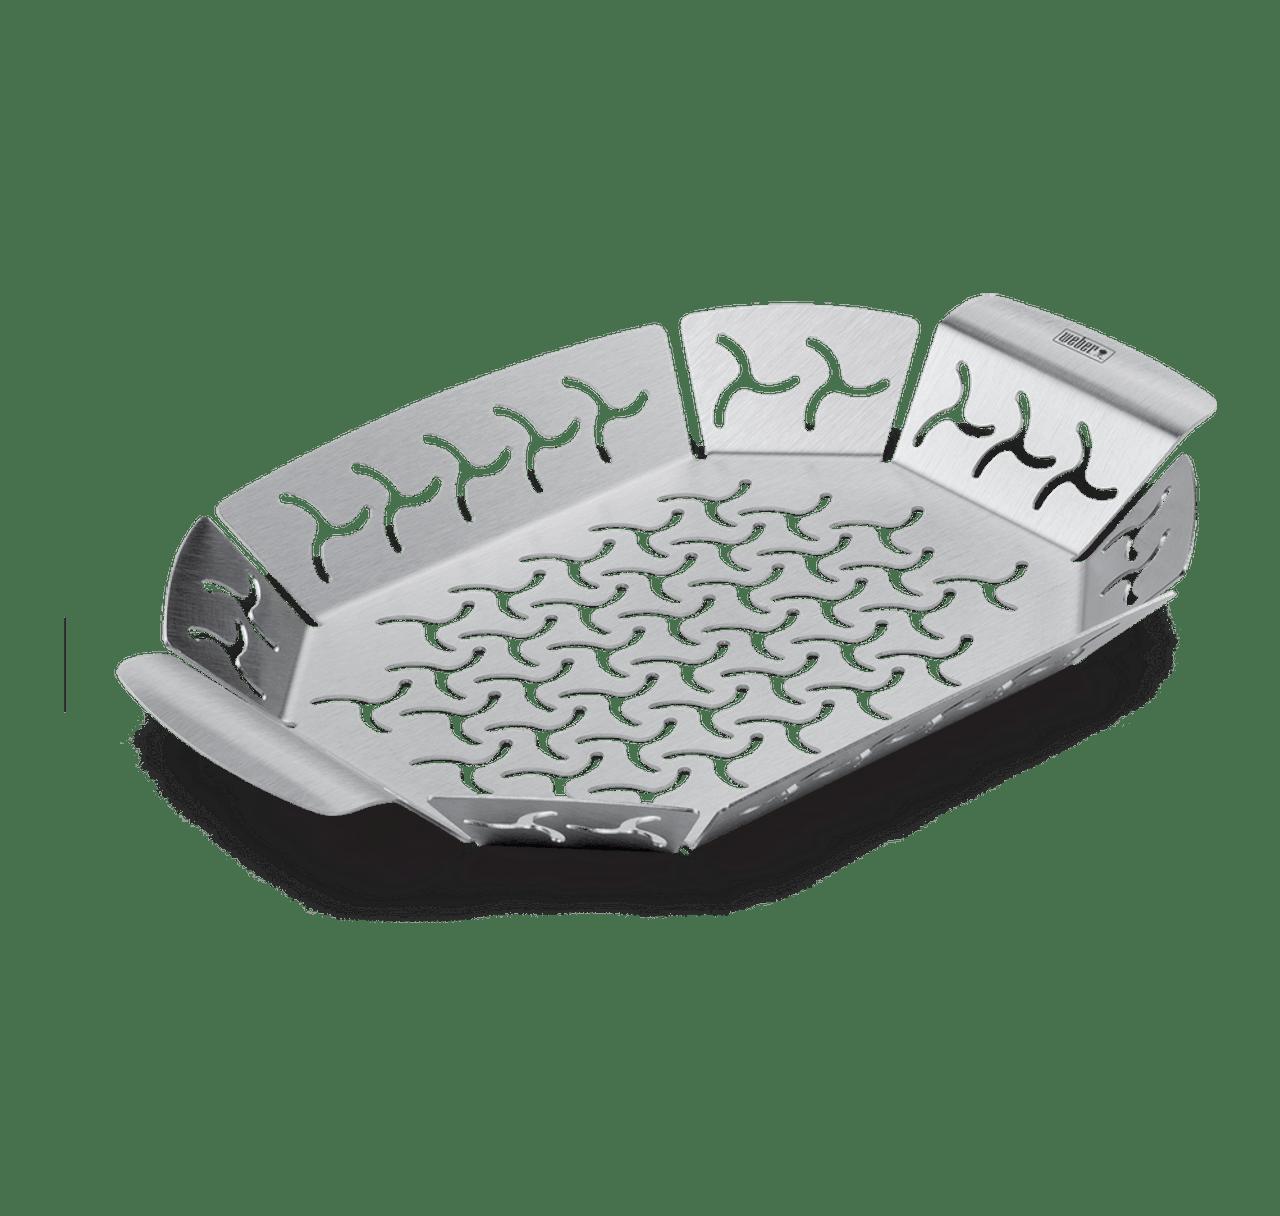 Weber Premium Grilling Basket Small